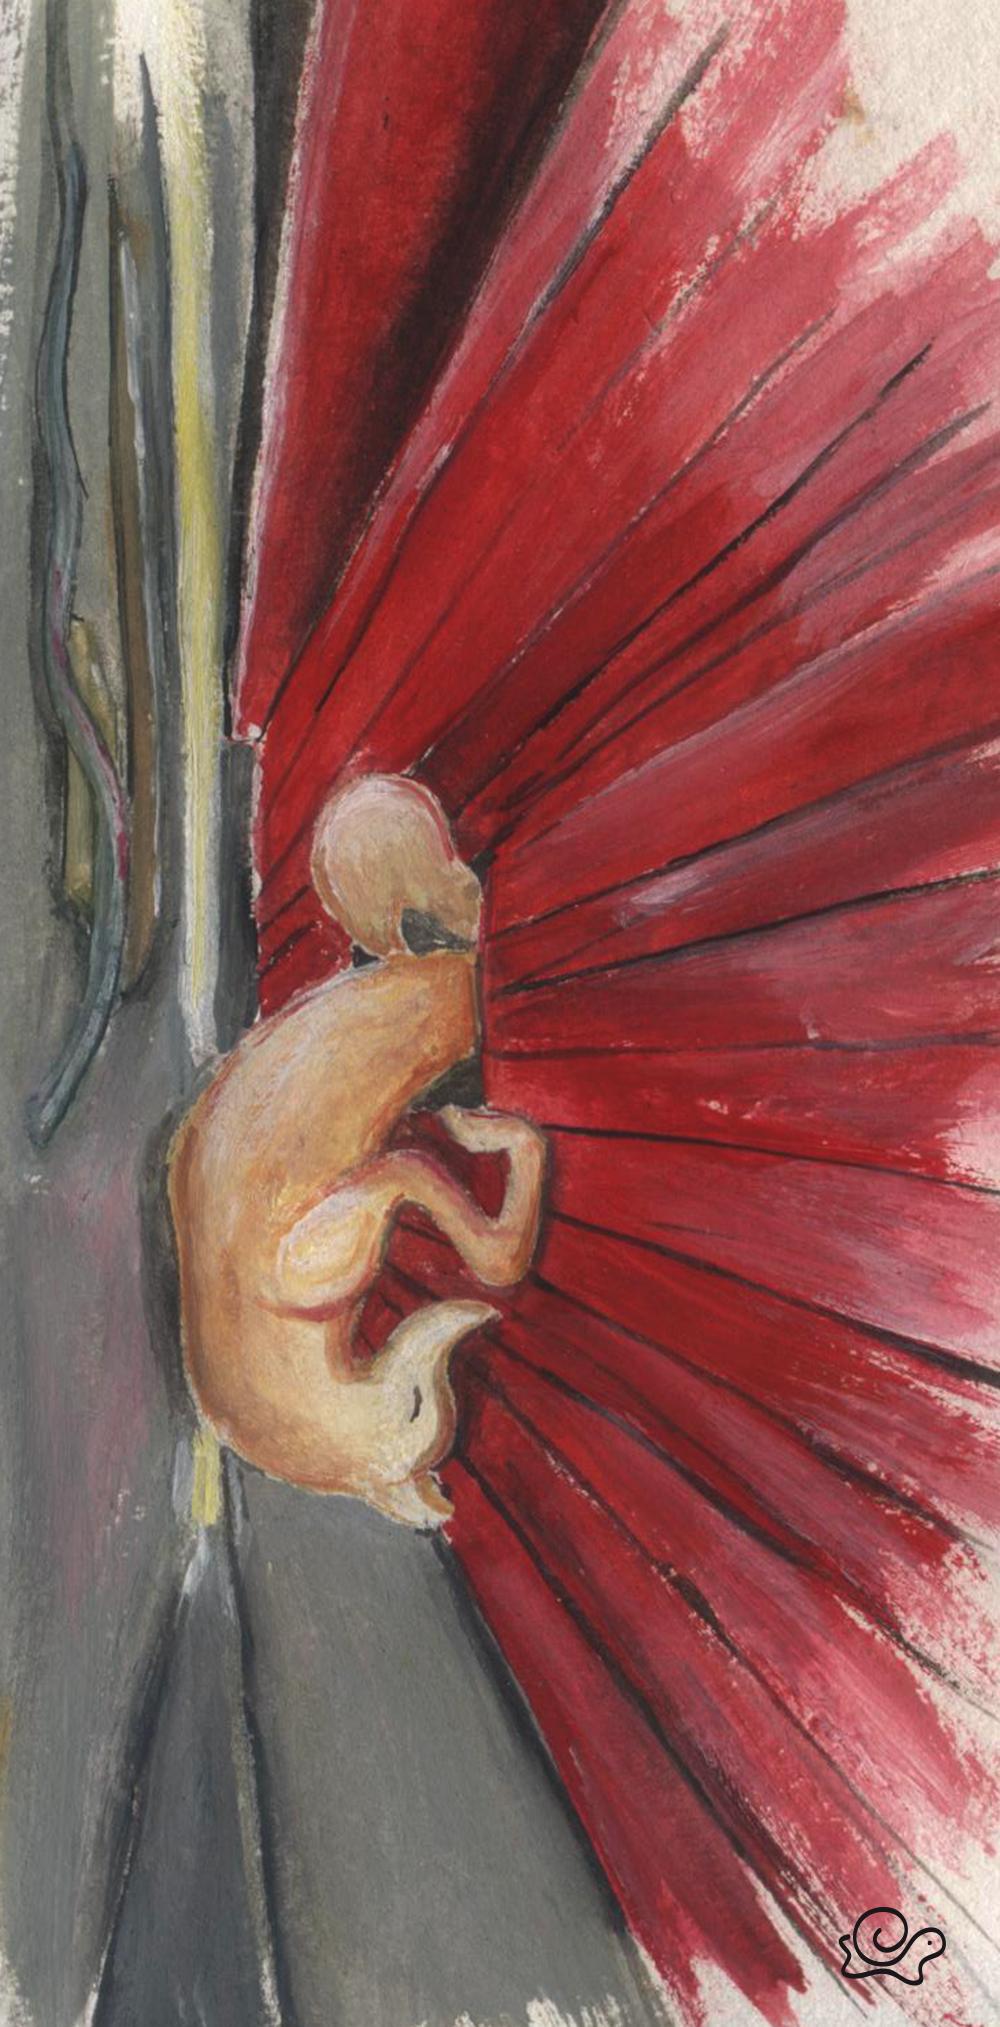 Oinari - by Yukiko Meignien